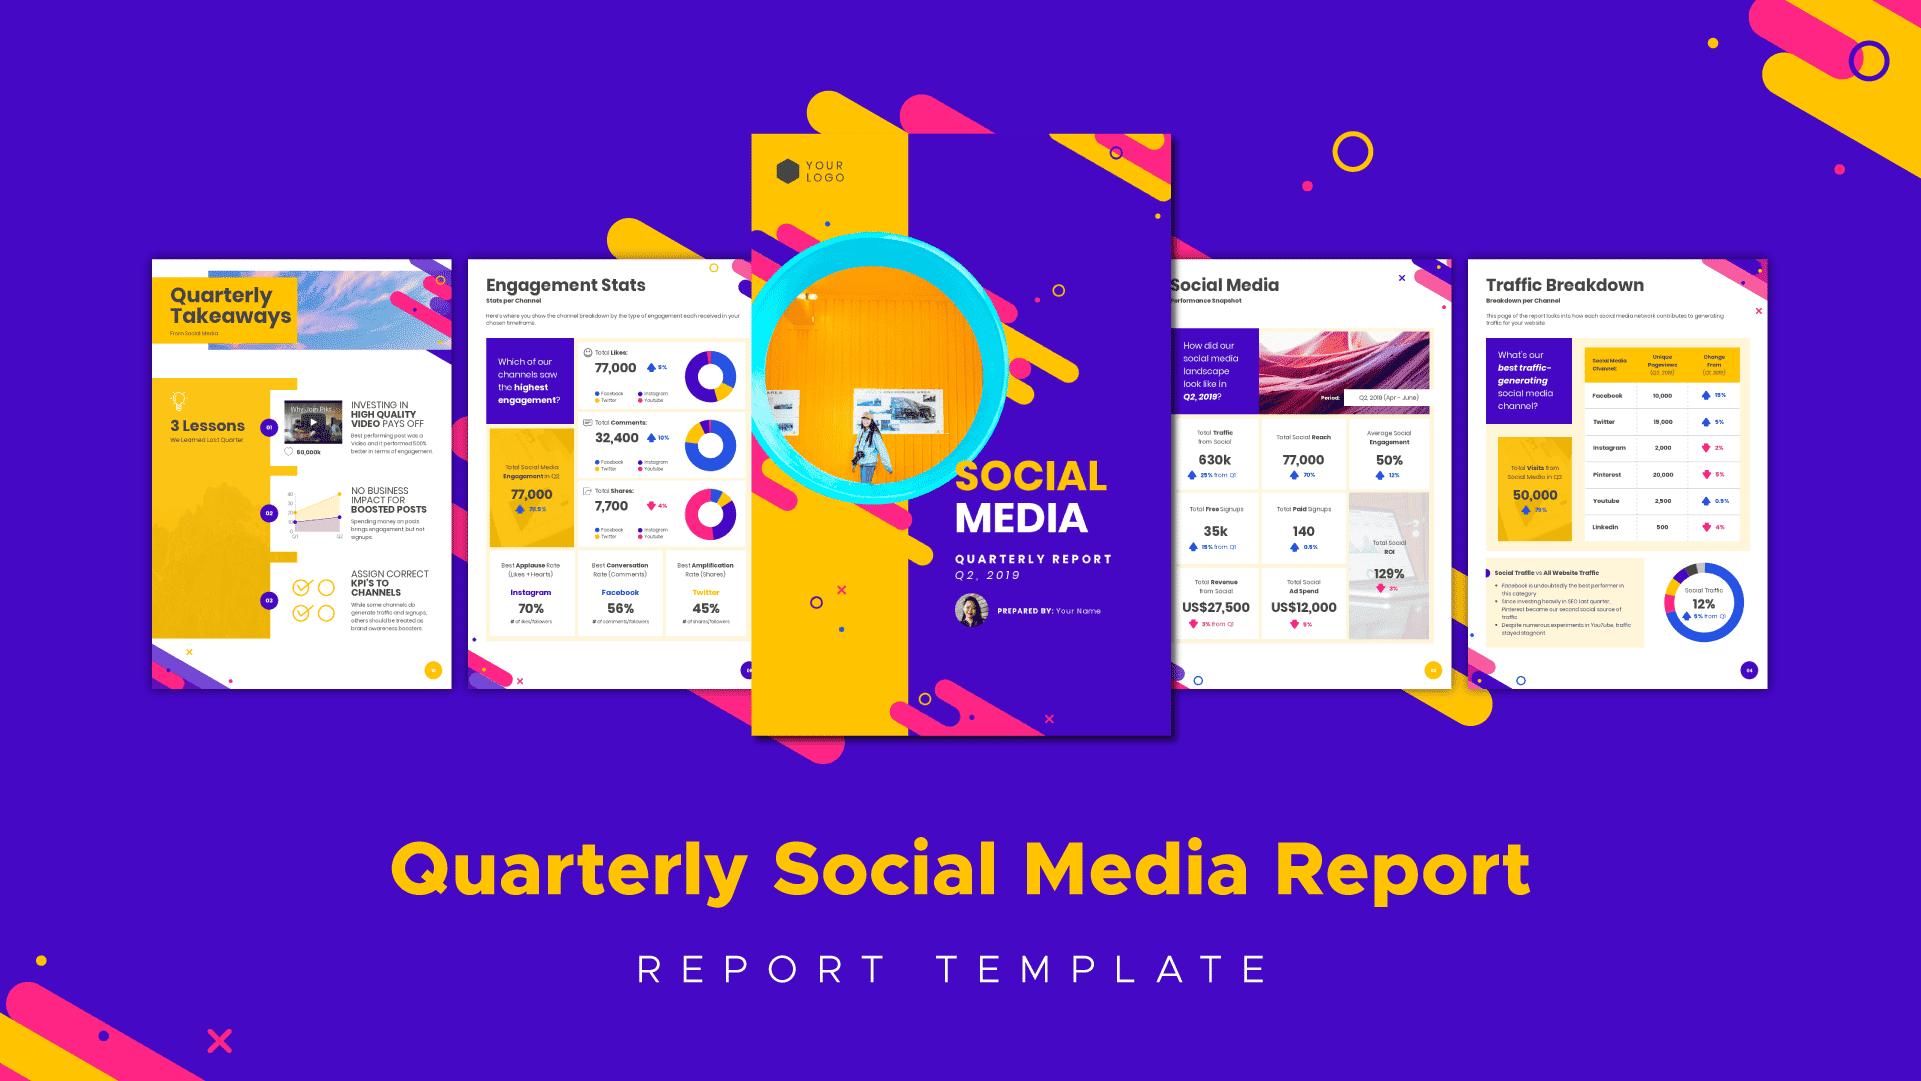 templates-visual_report_1184-1-9961537